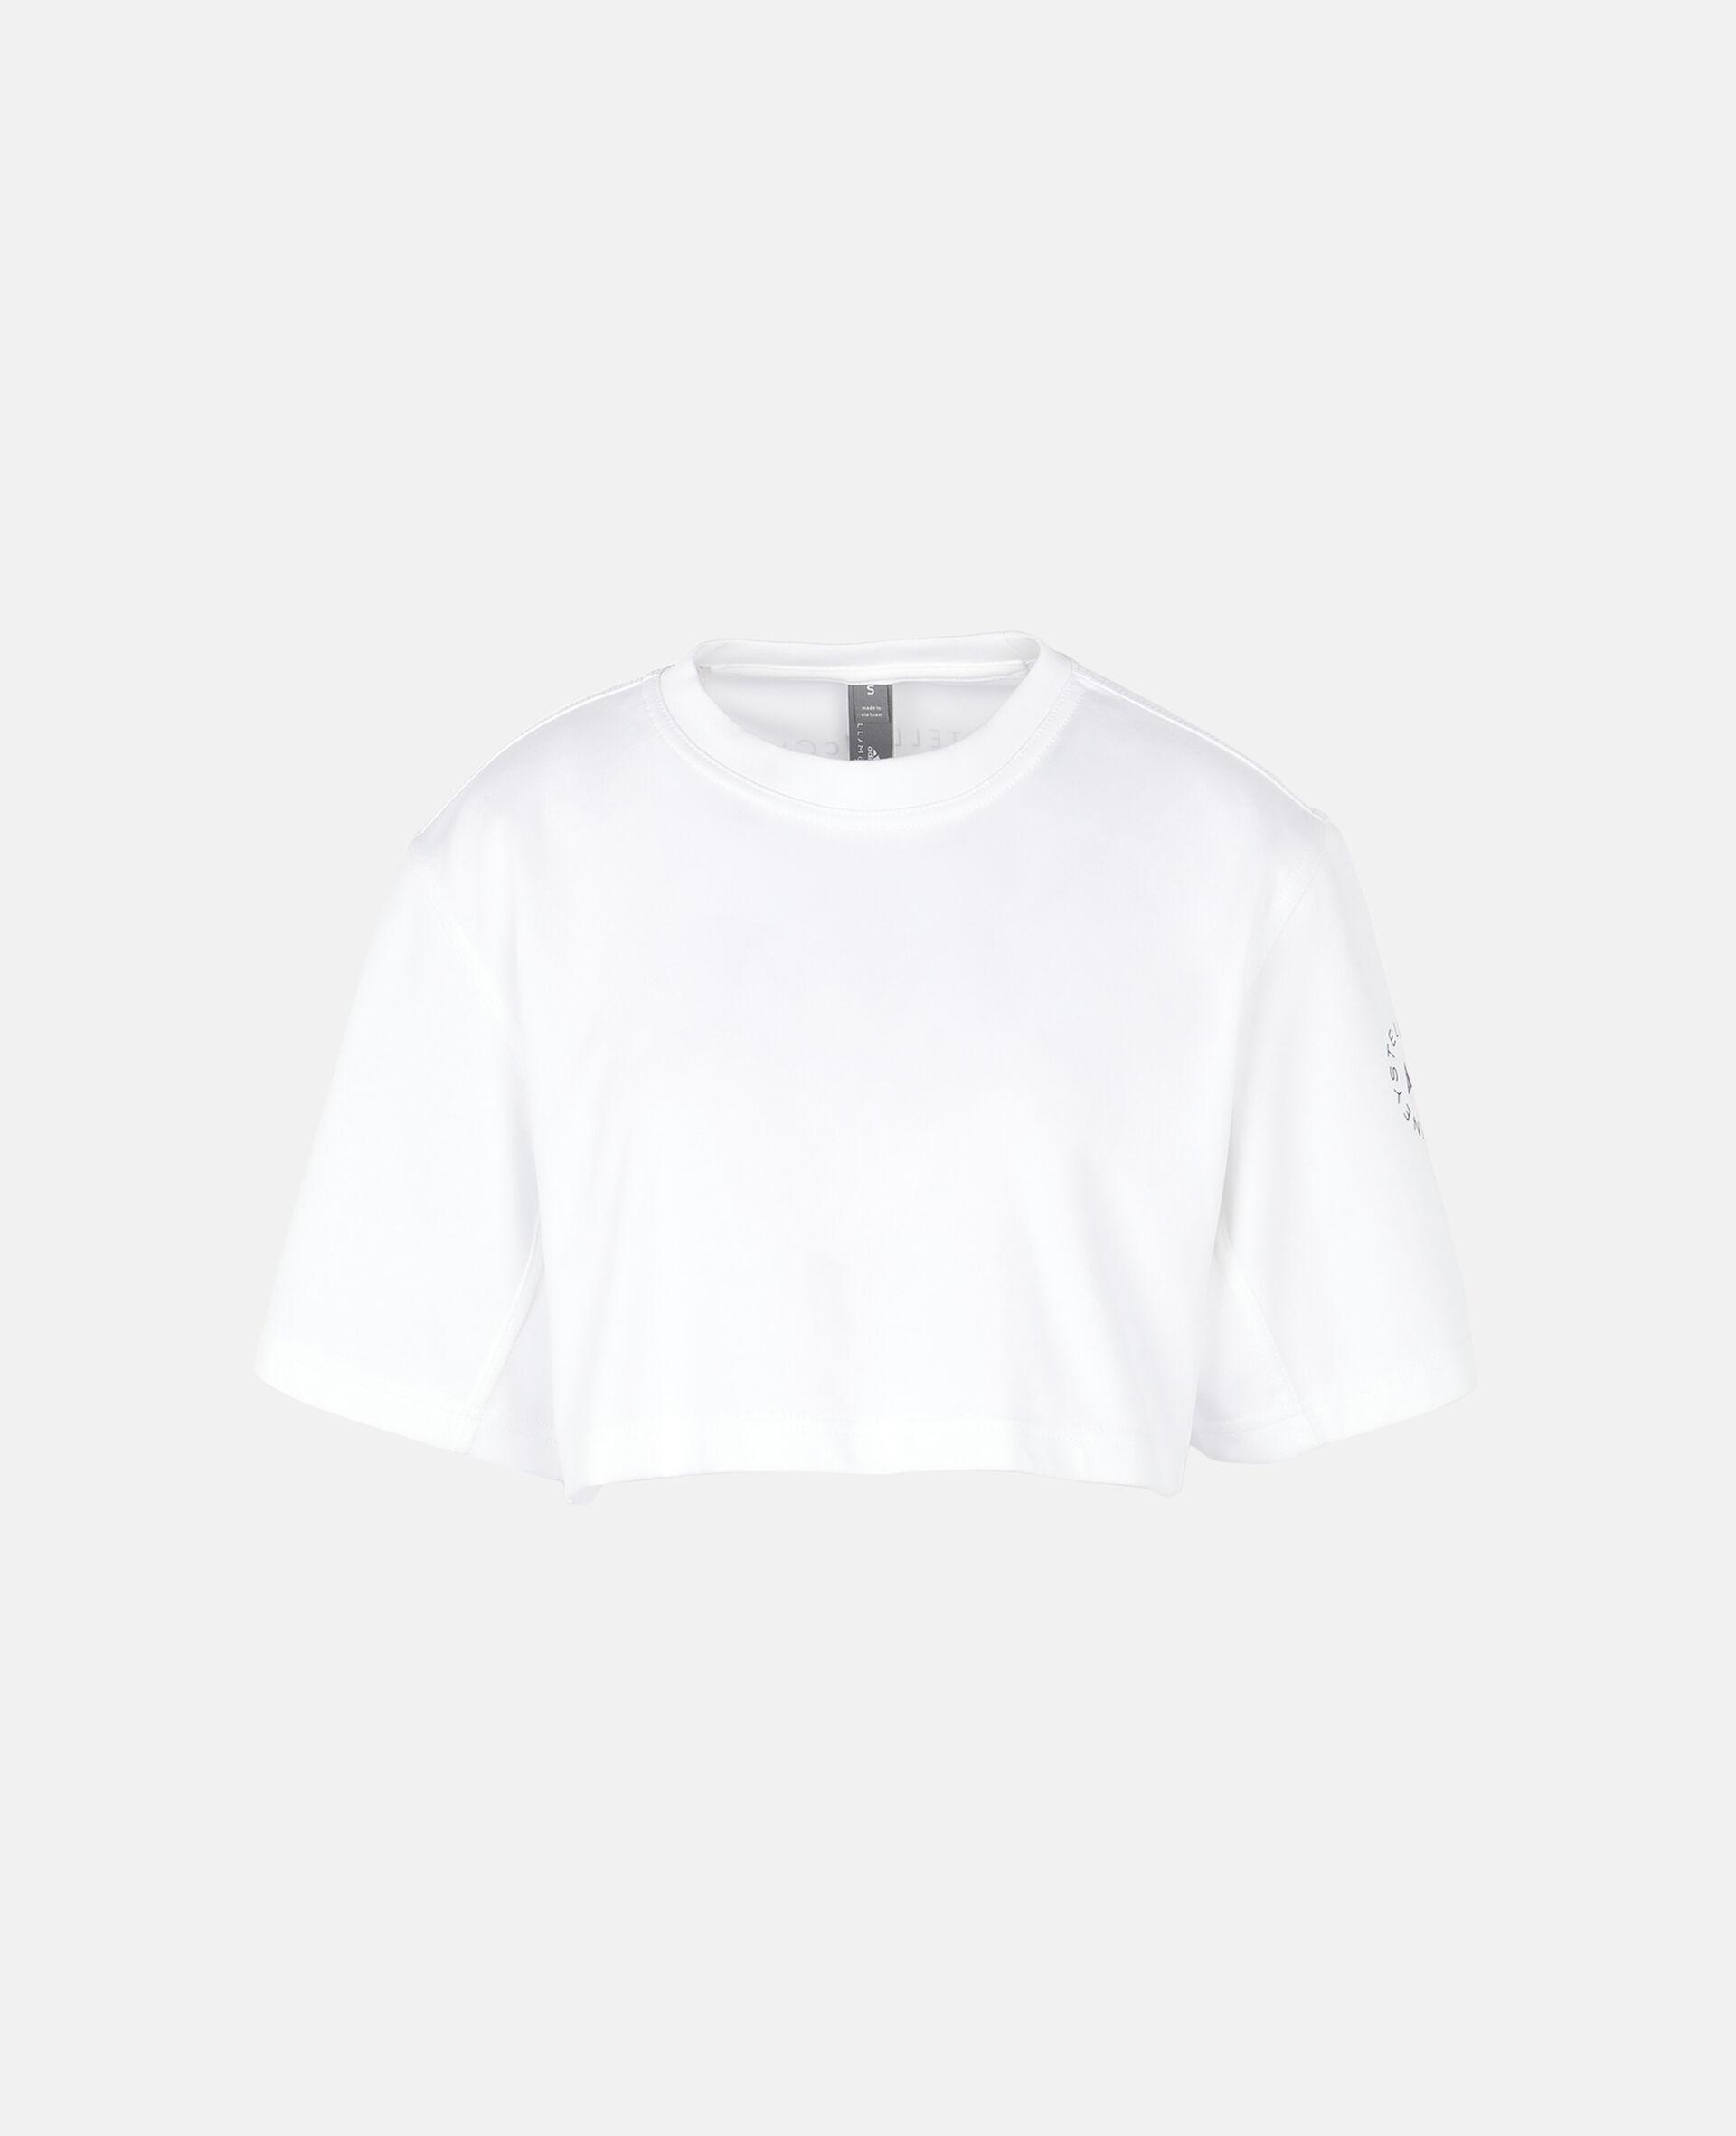 Future Playground Crop T-Shirt-White-large image number 0